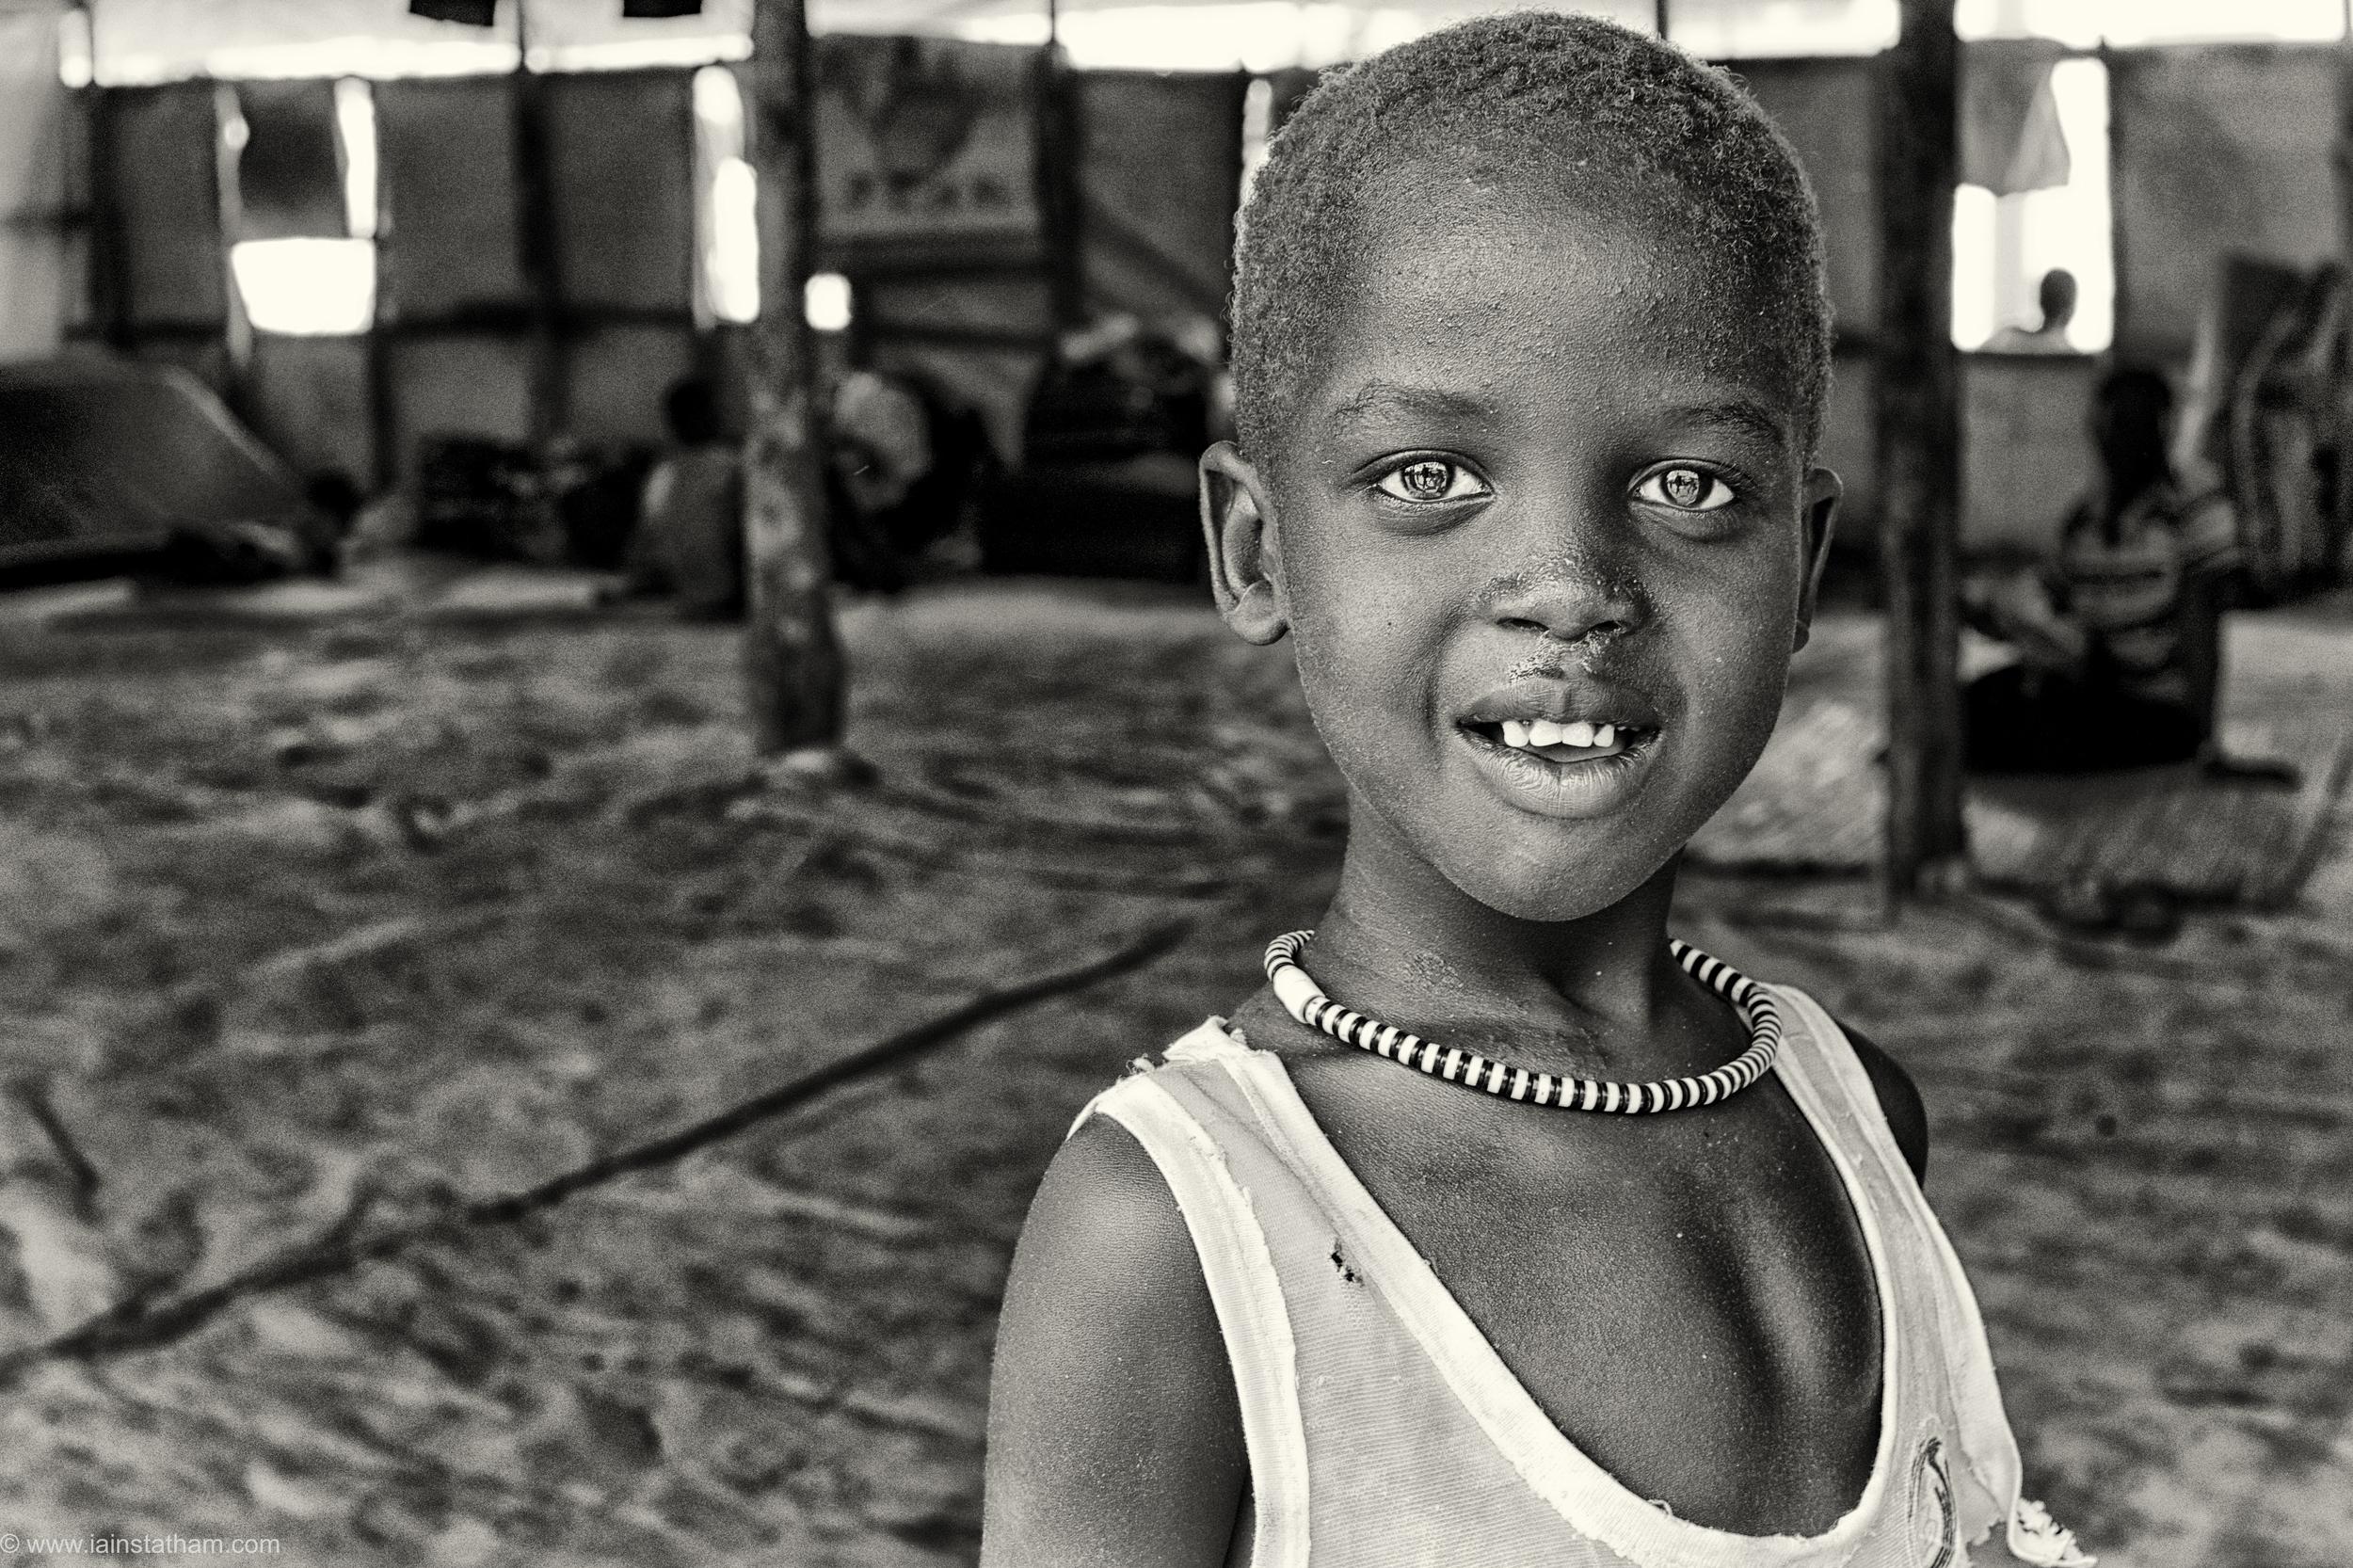 ug - south sudan refugees - dziapi - bw-23.jpg